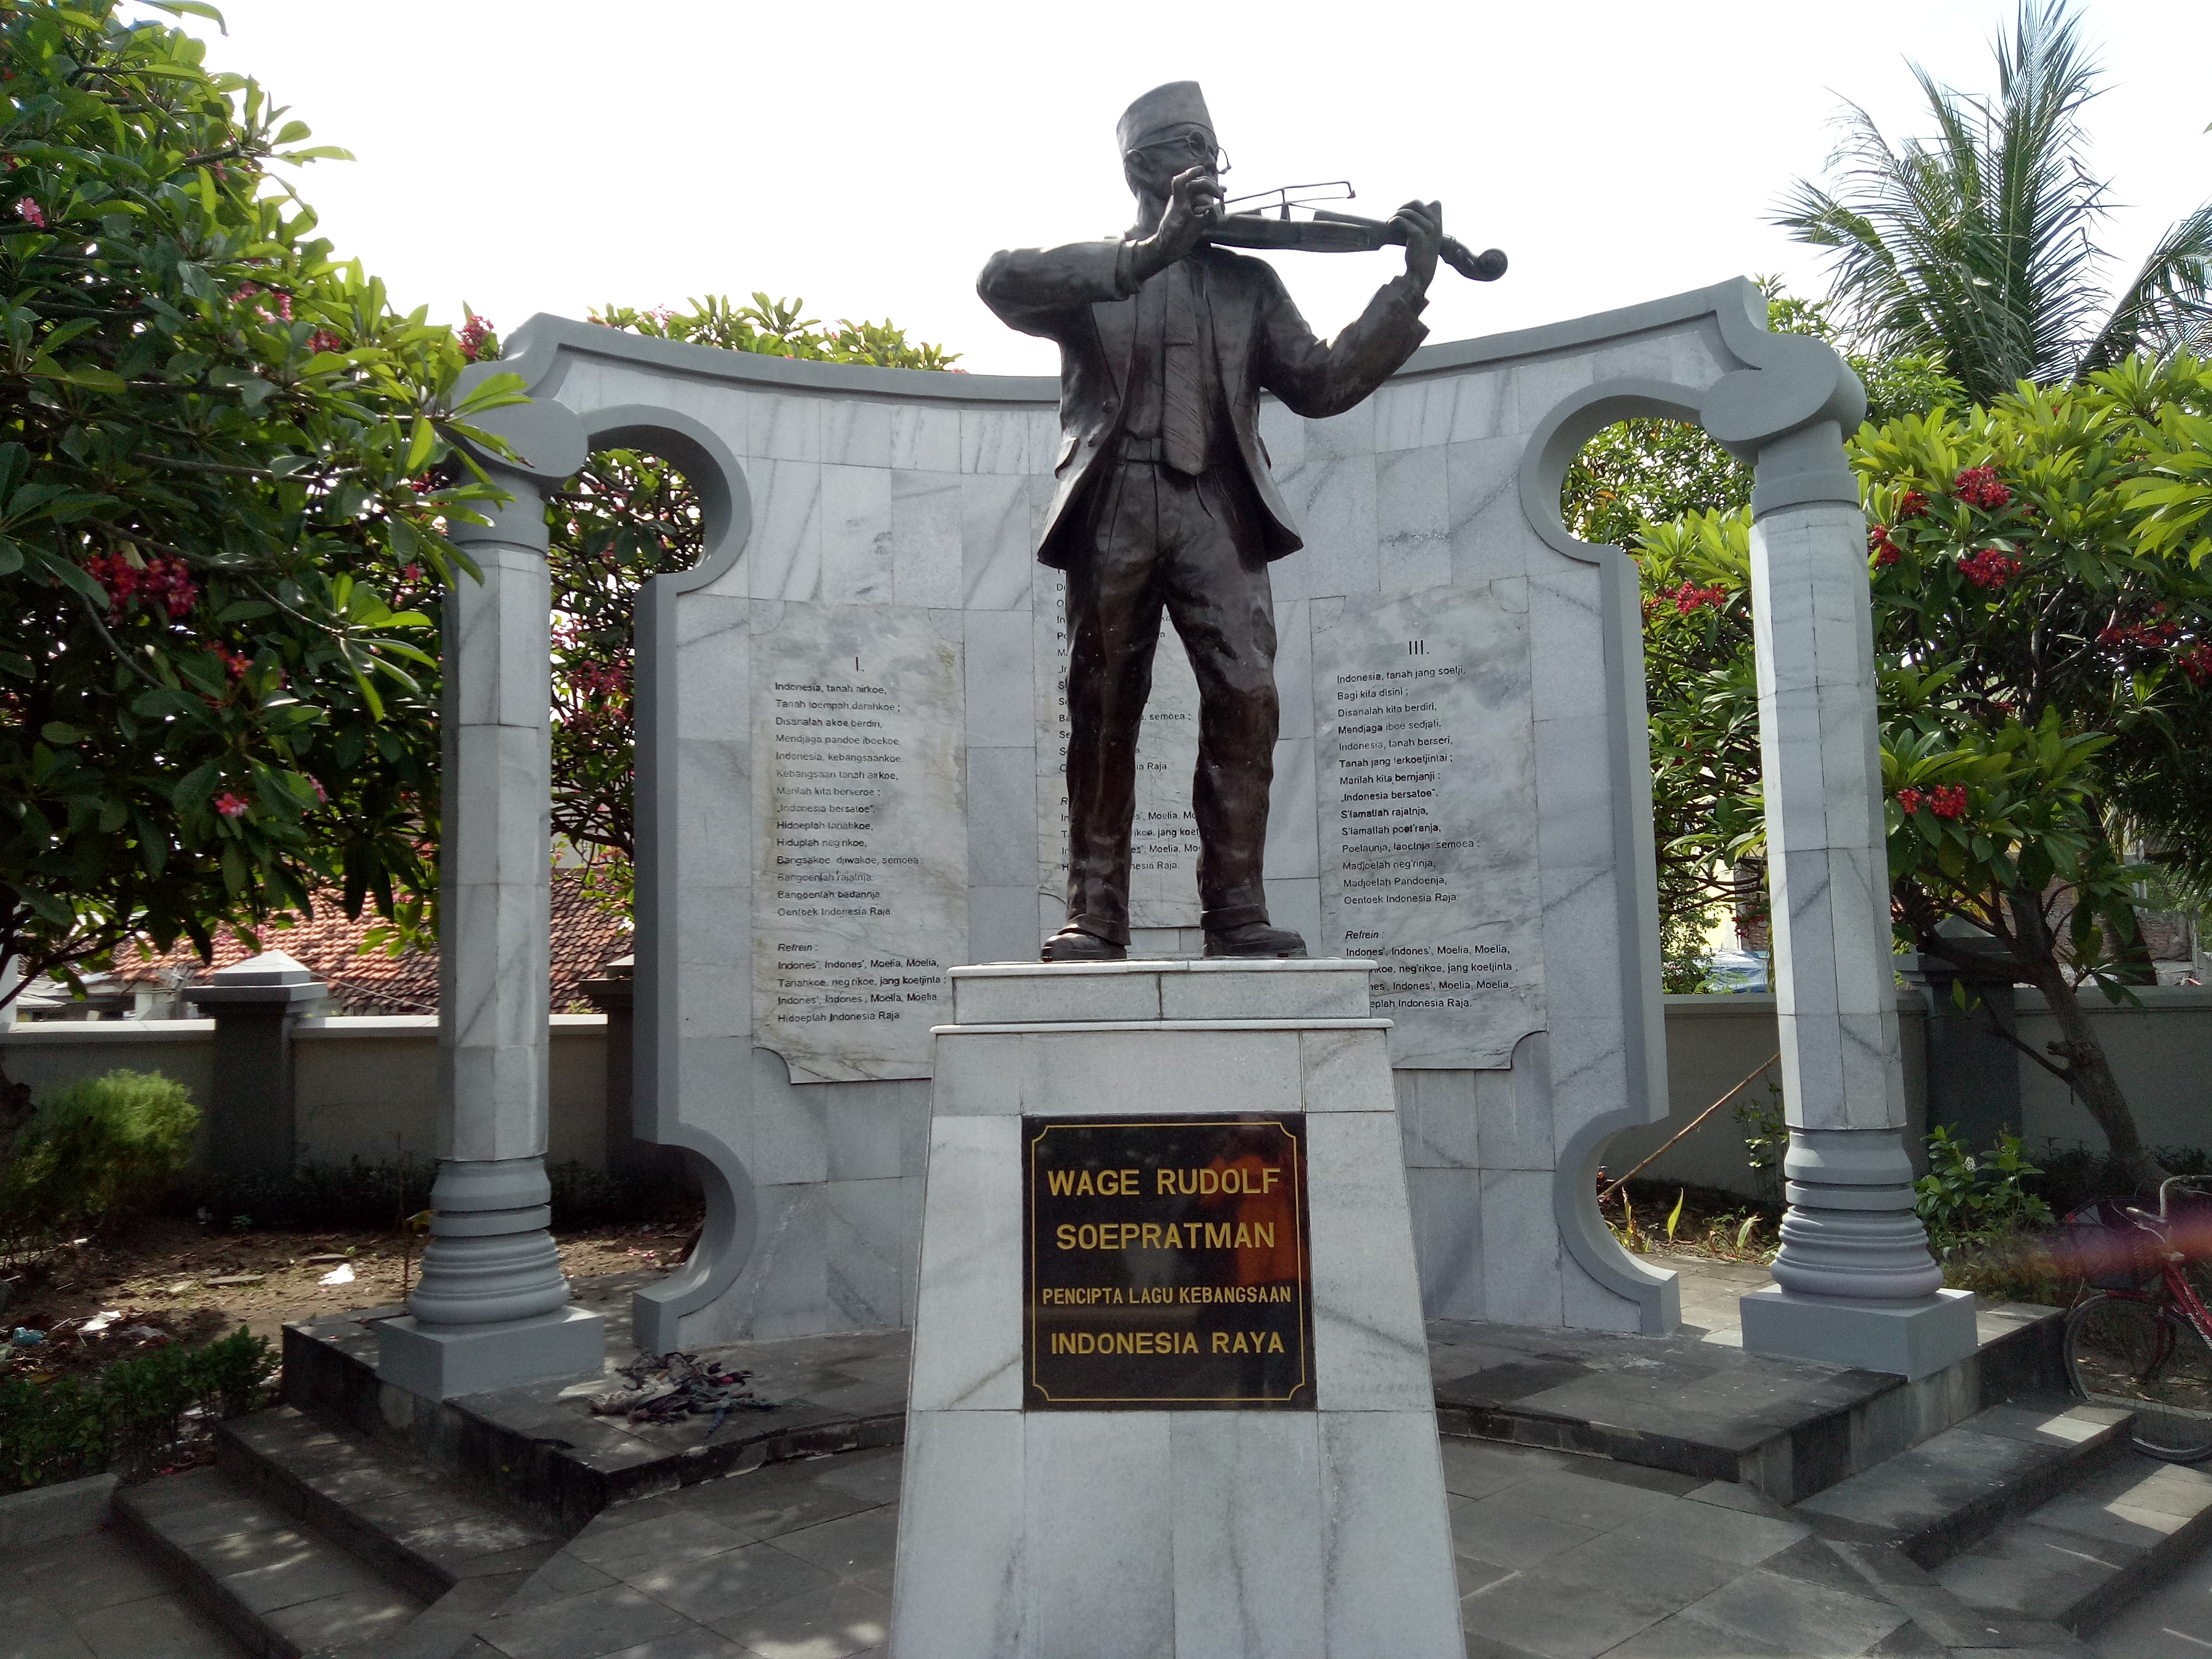 Menengok Makam Wr Soepratman Surabaya Patung Komplek Wisata Museum Kota